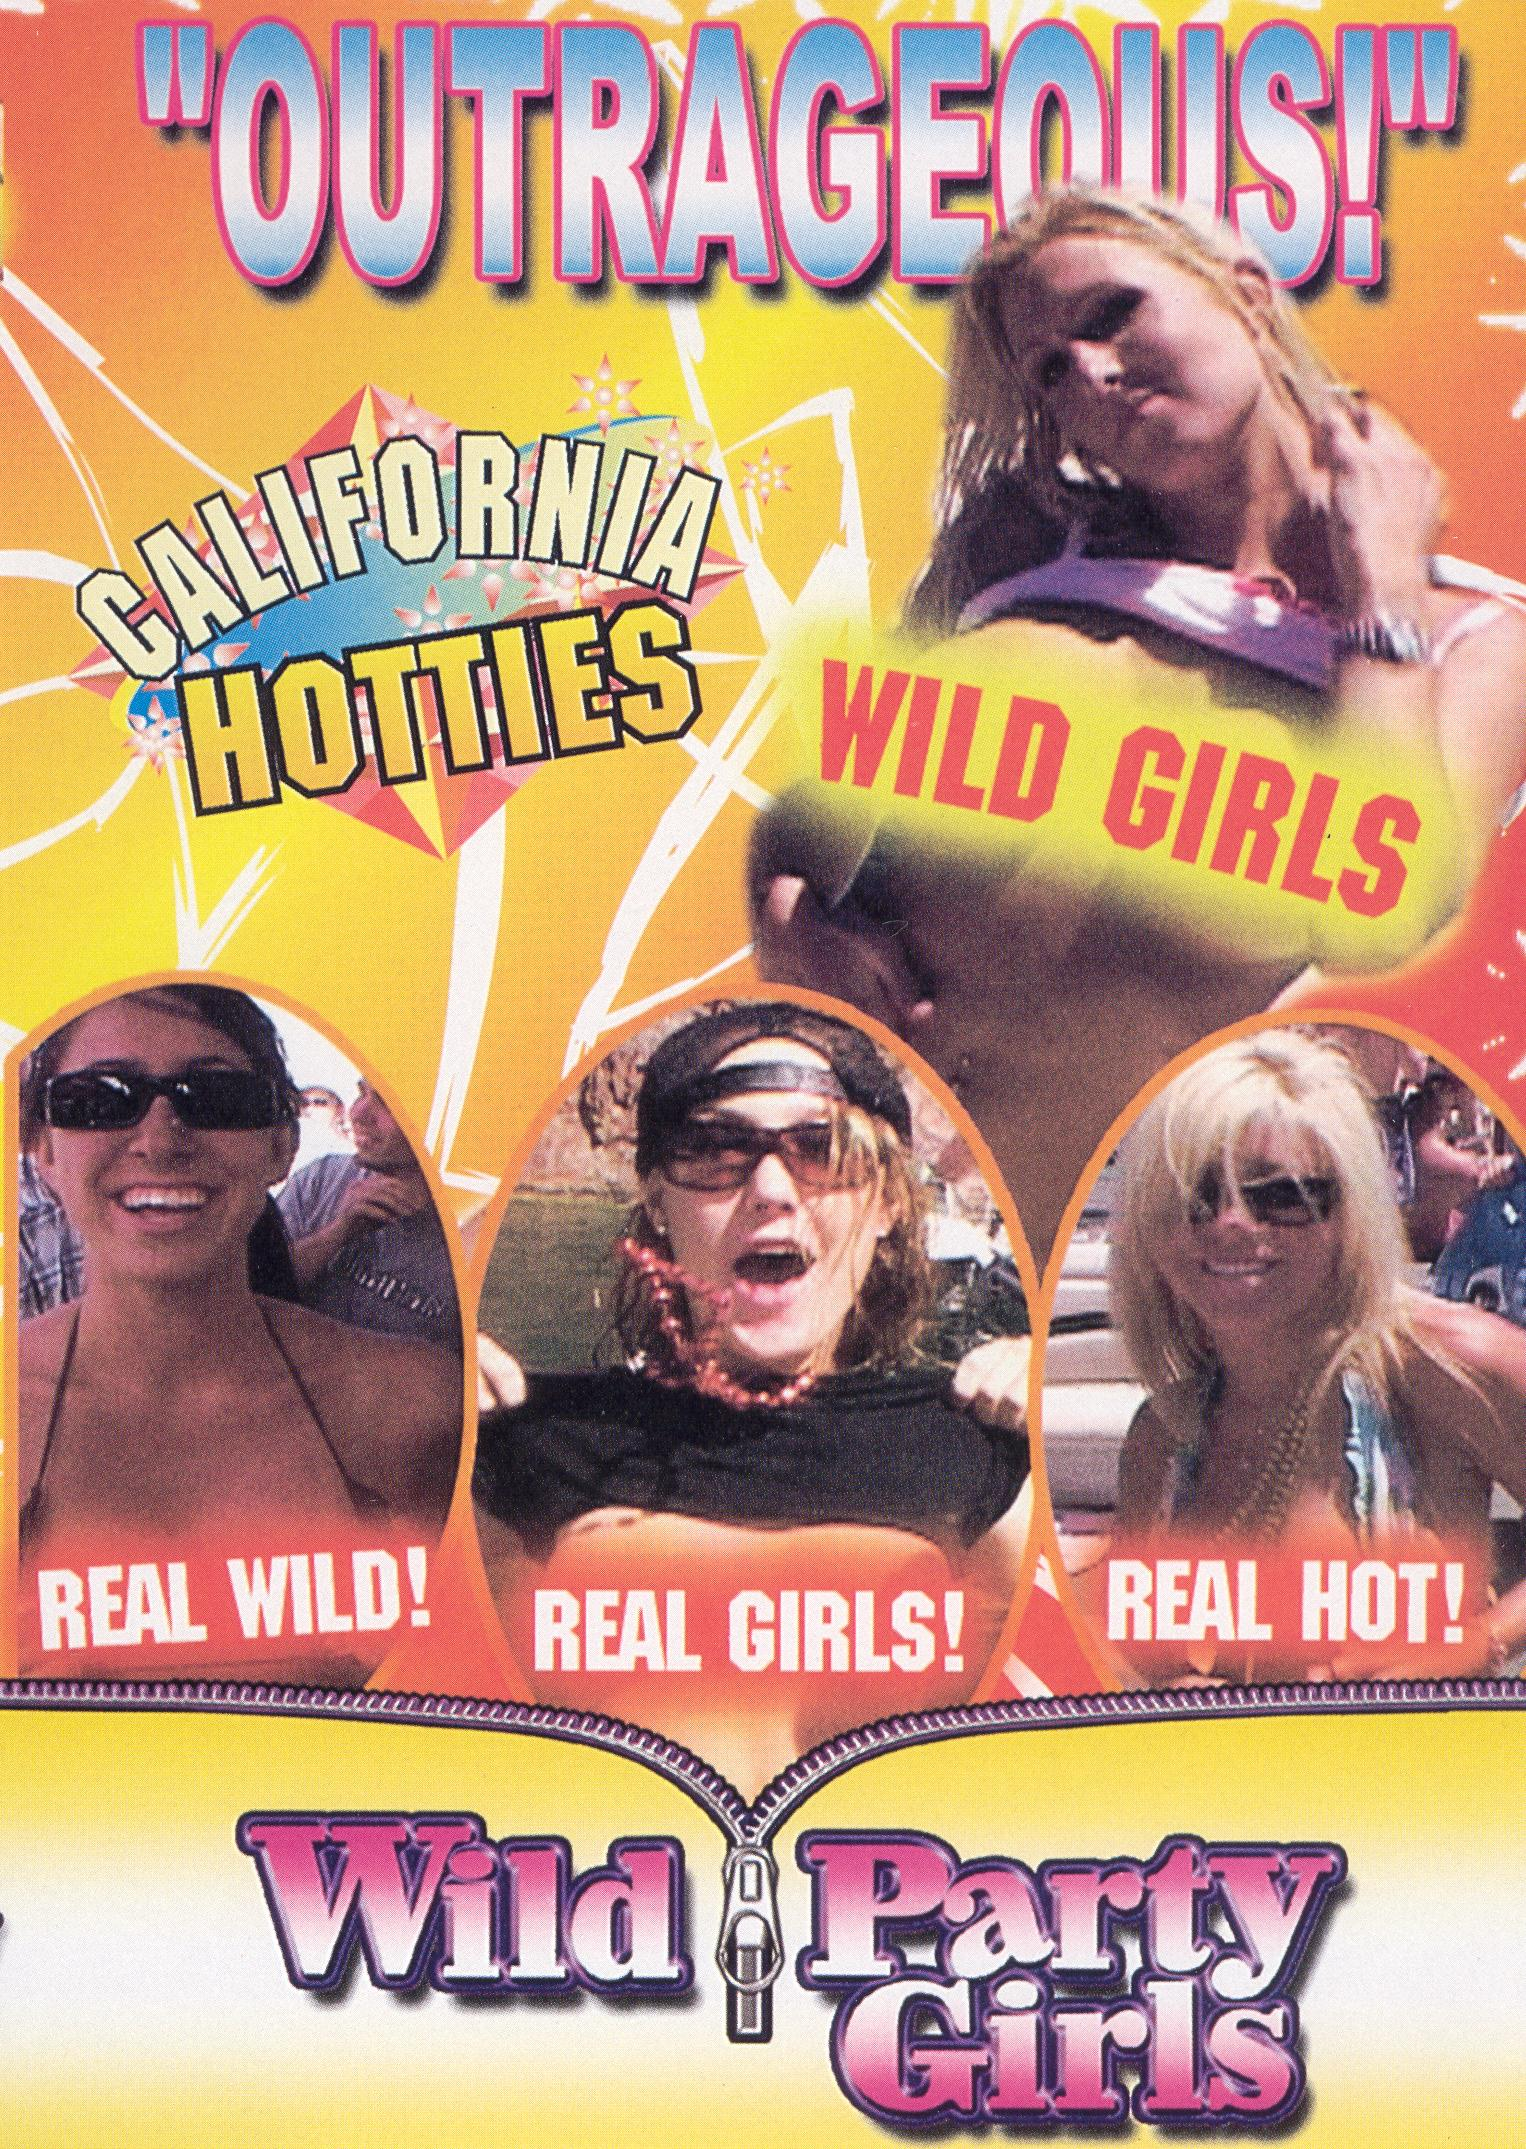 Wild Party Girls: California Hotties